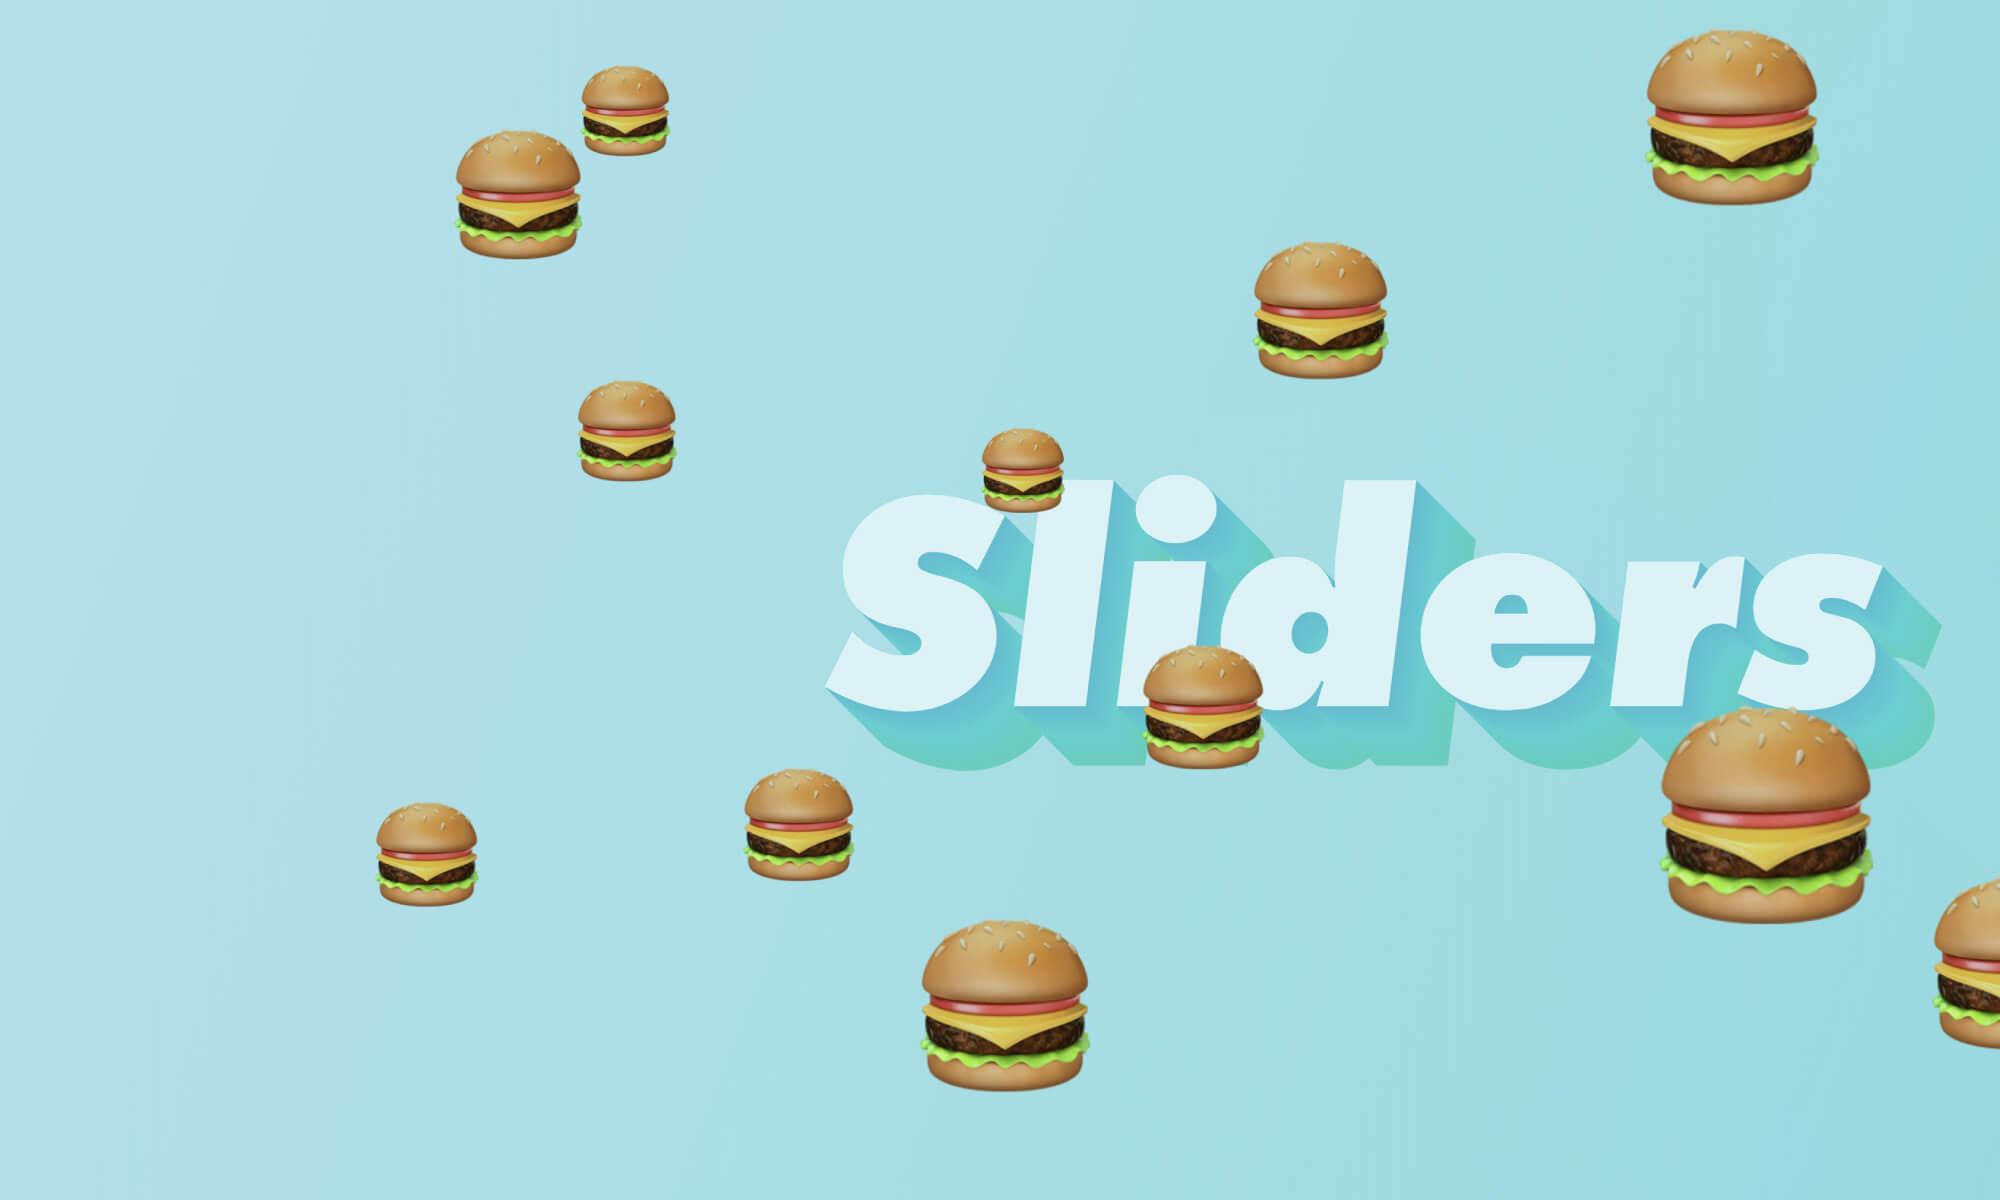 Good Burger Sliders